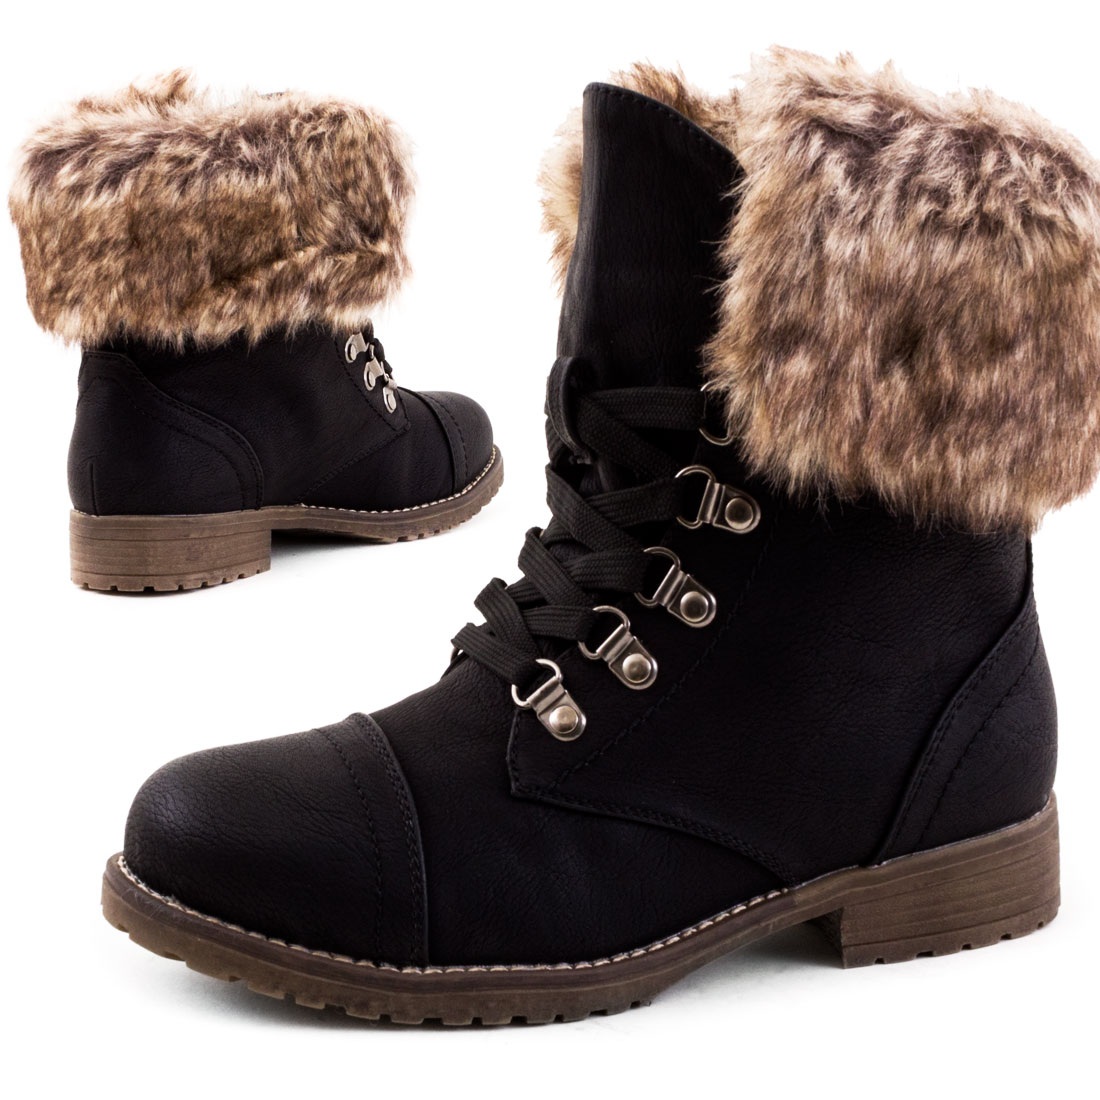 neu damen gef ttert schn r boots winter stiefeletten. Black Bedroom Furniture Sets. Home Design Ideas